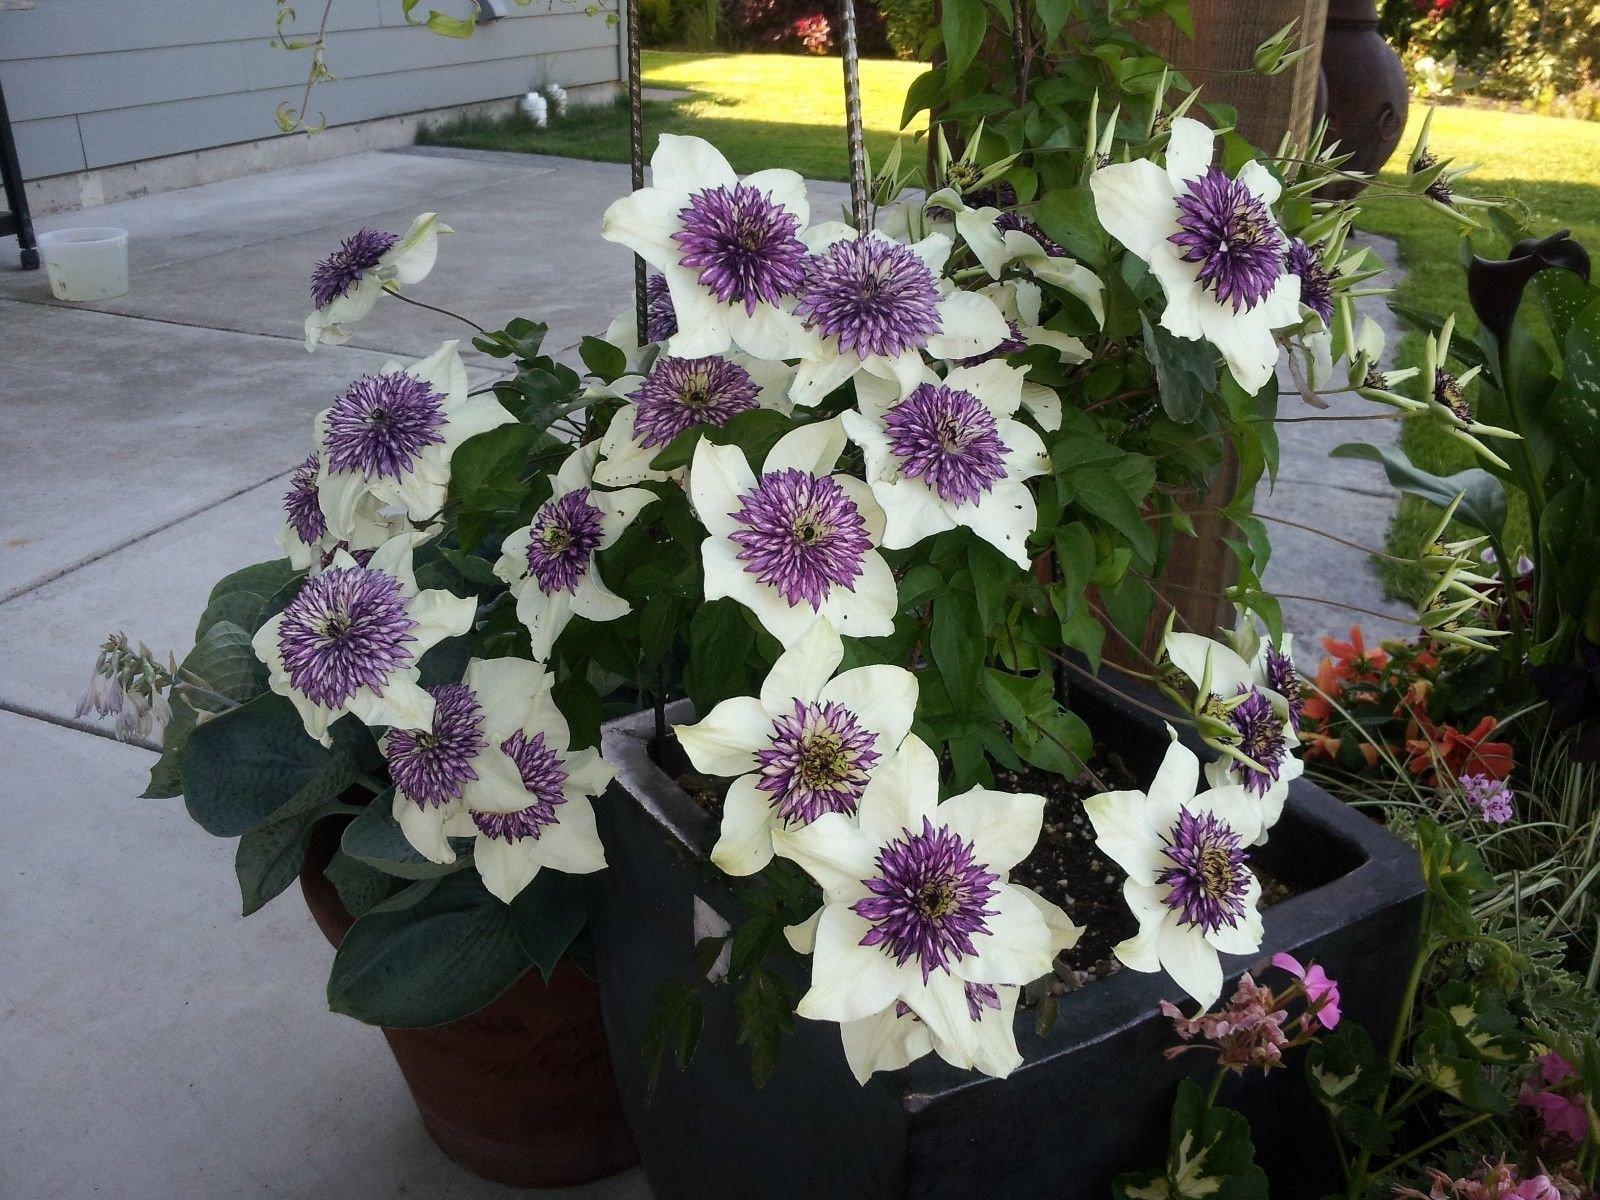 Clematis ' Florida Sieboldii' (1Bare Root) ,Large-flowered Vine!